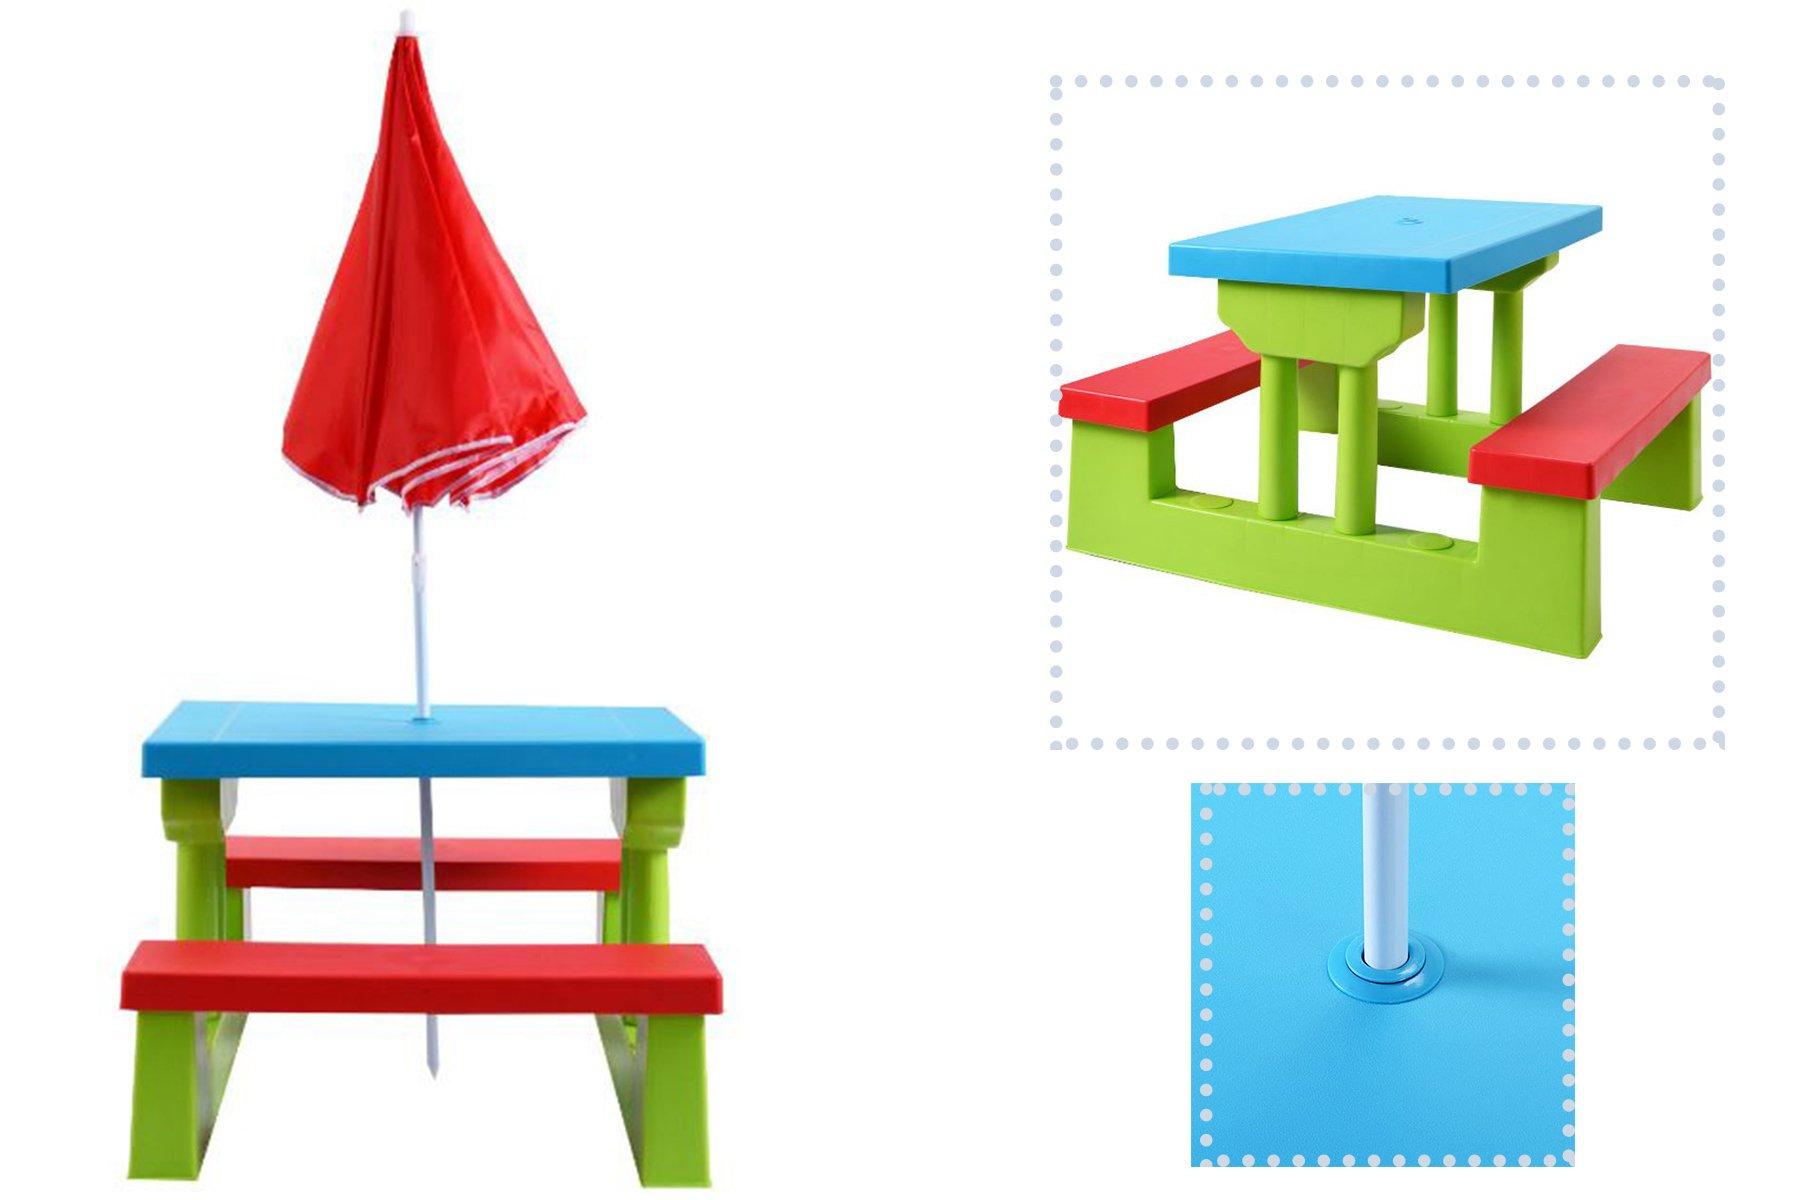 eXXtra Store Outdoor Children Folding Bench Table With Umbrella Garden Picnic Kids 4 Seat Yard + eBook